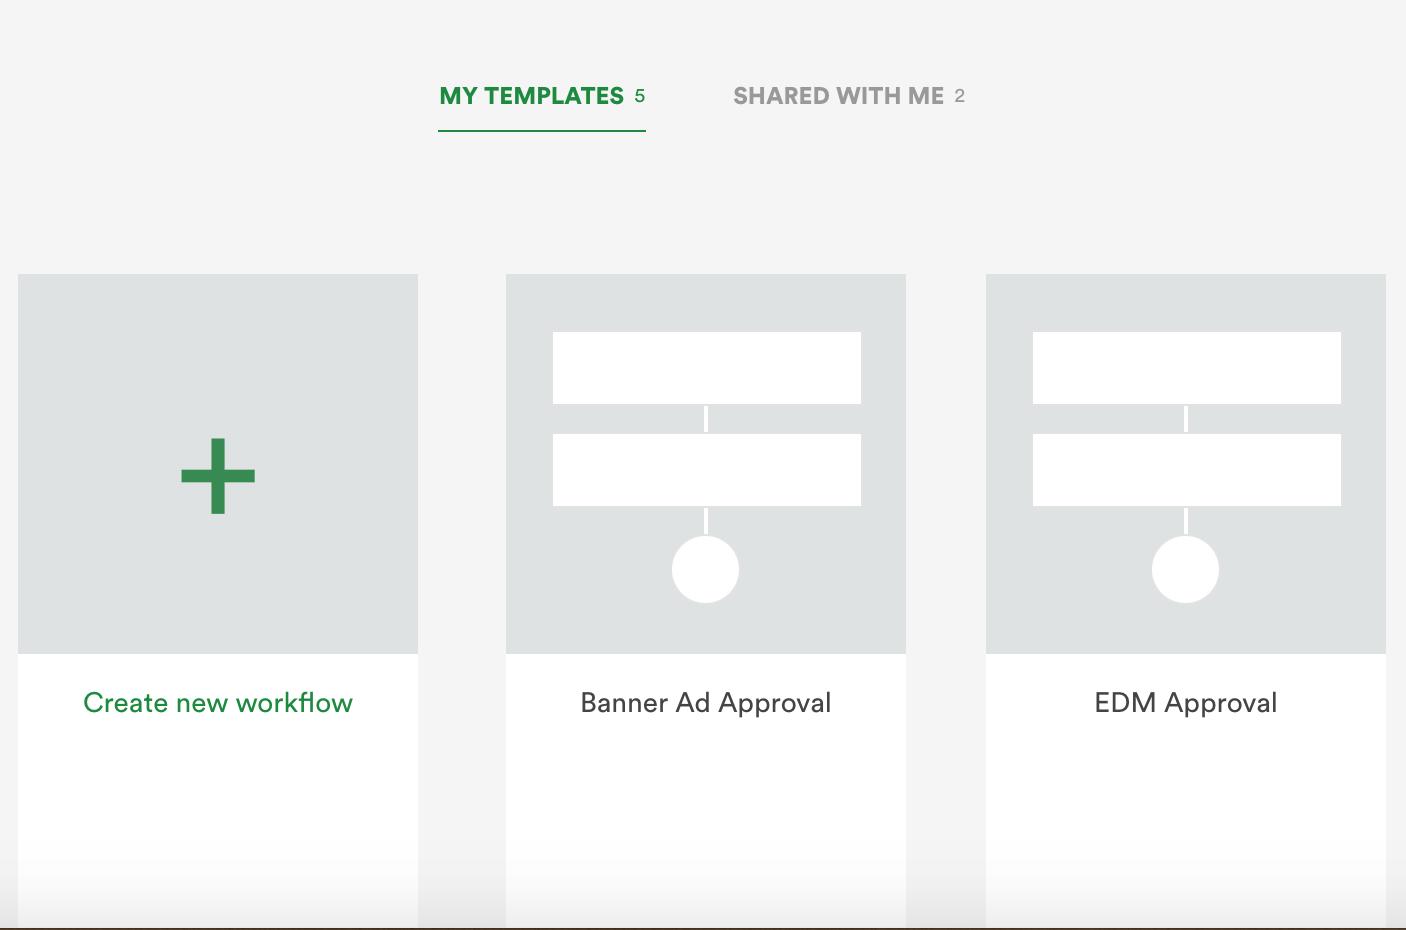 Workflow template tiles